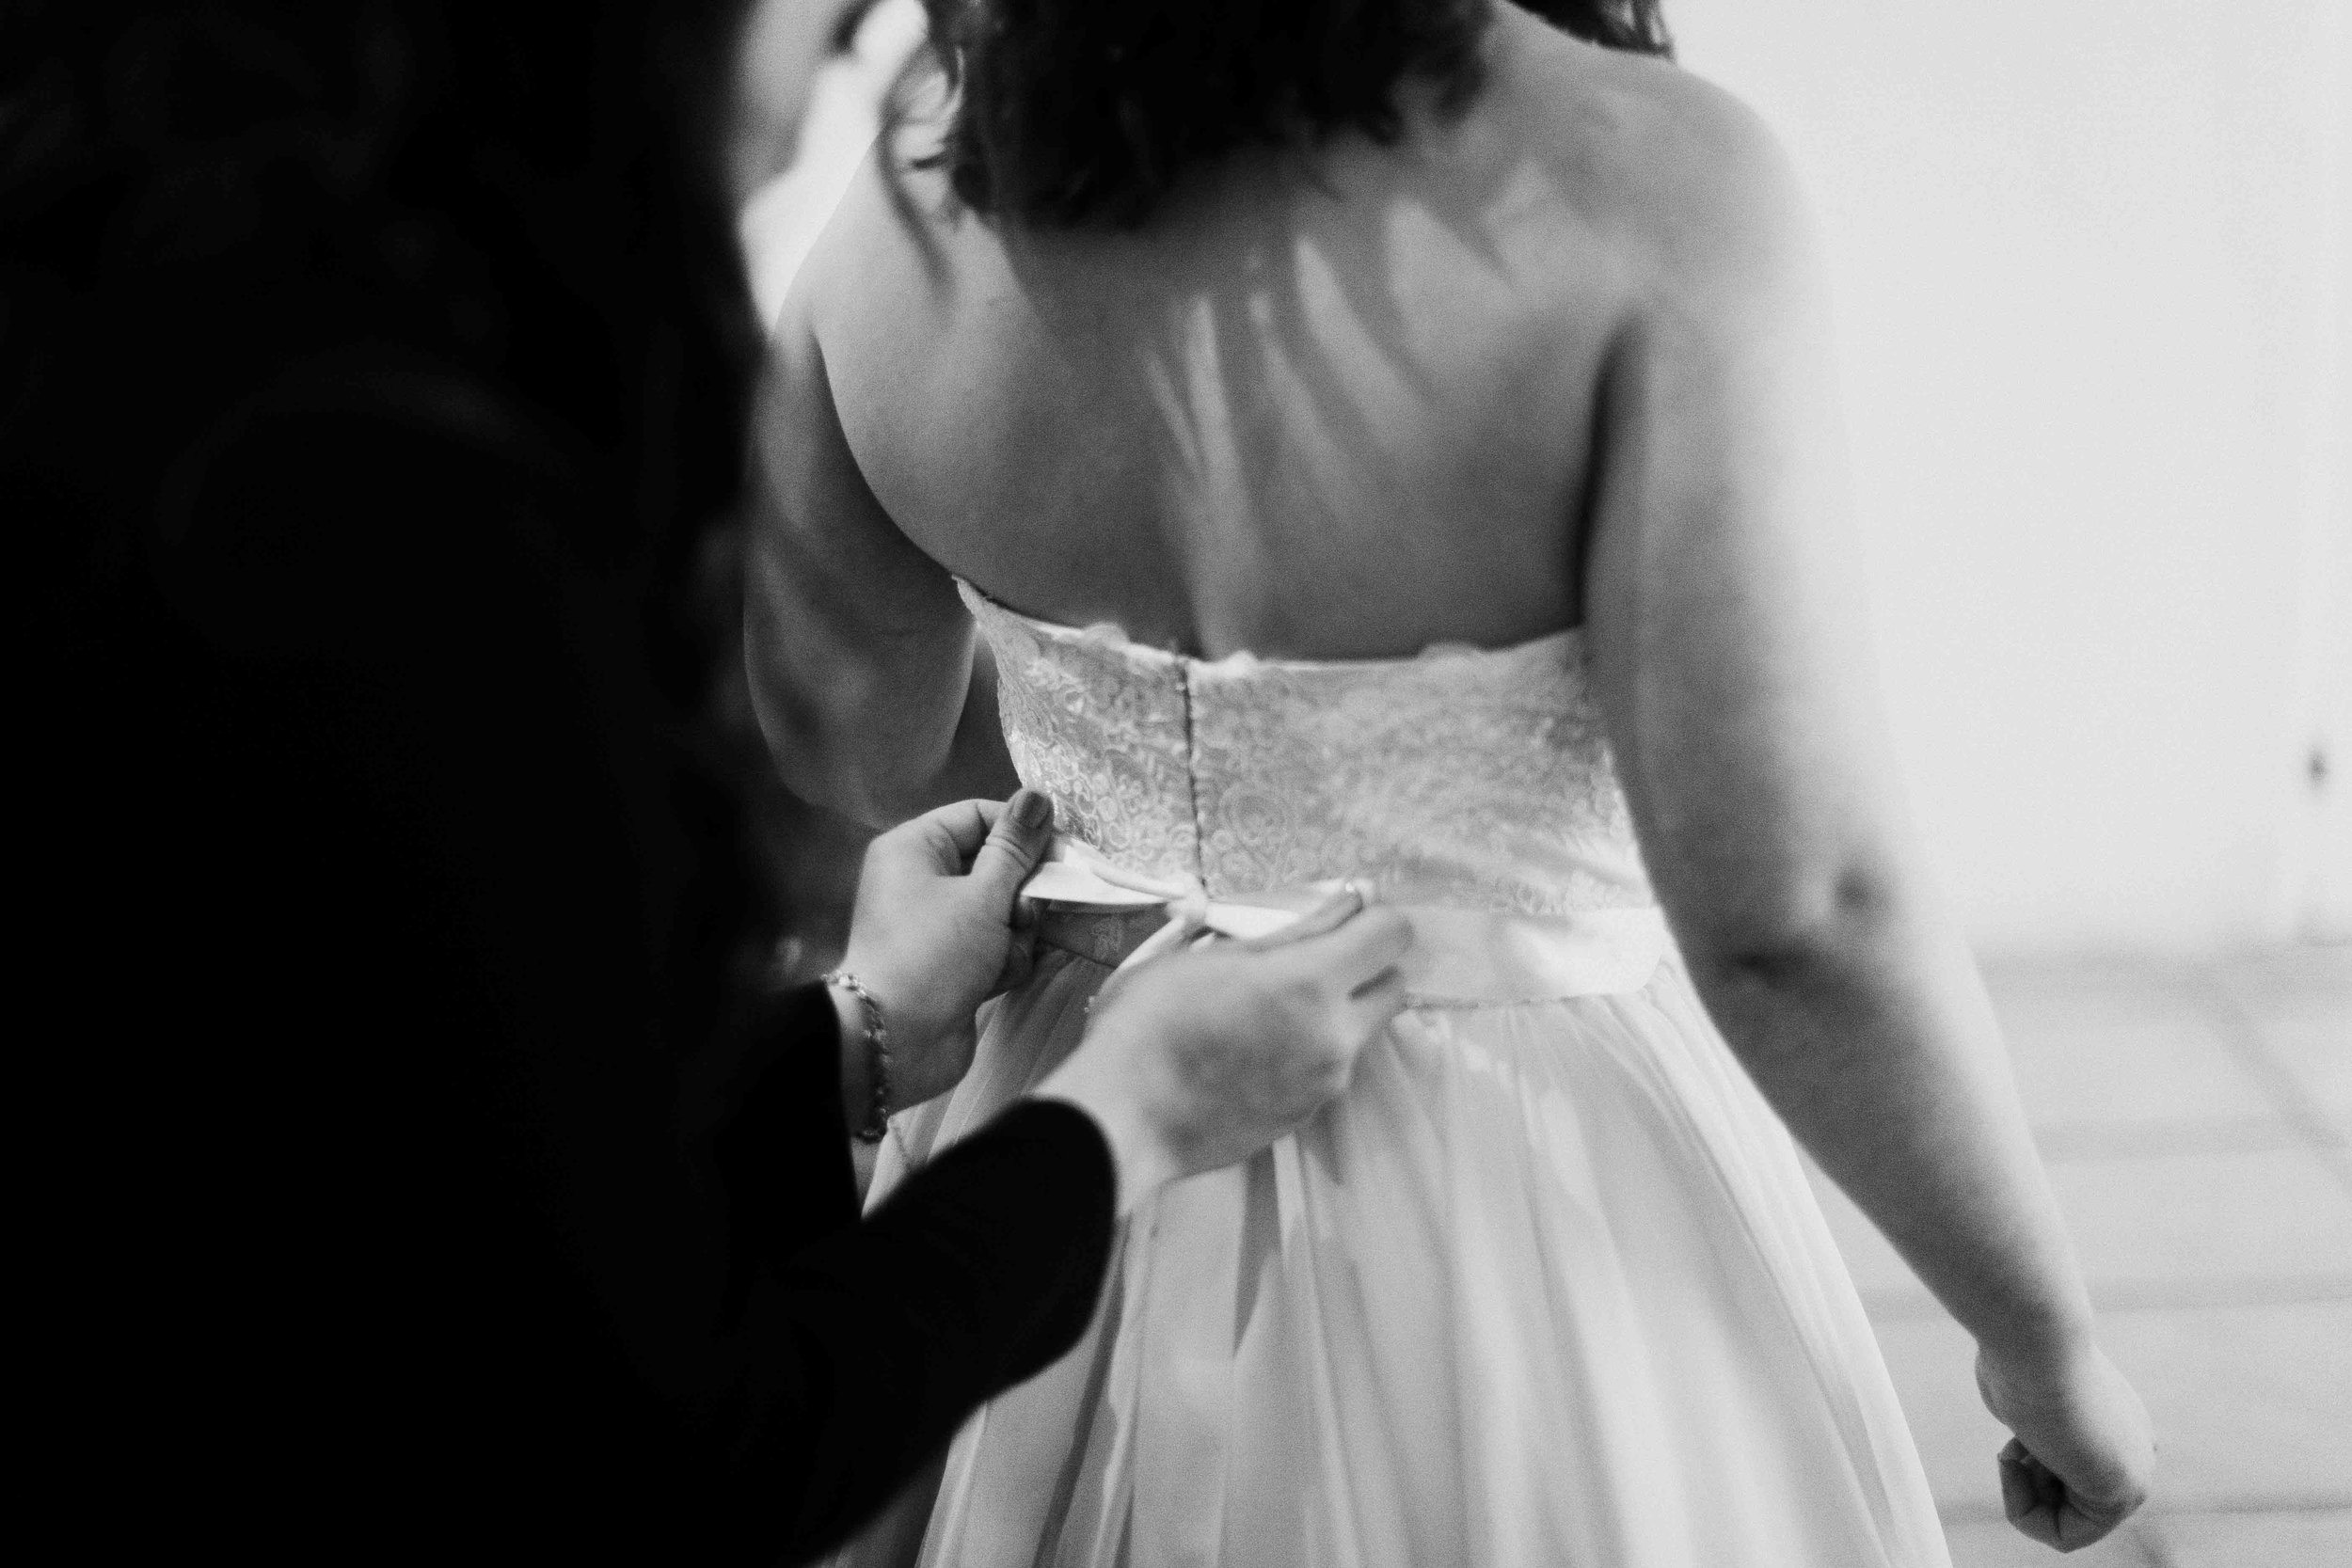 Kristi Smith Photography - Wedding Photography - Darryl & Meg 5.jpg